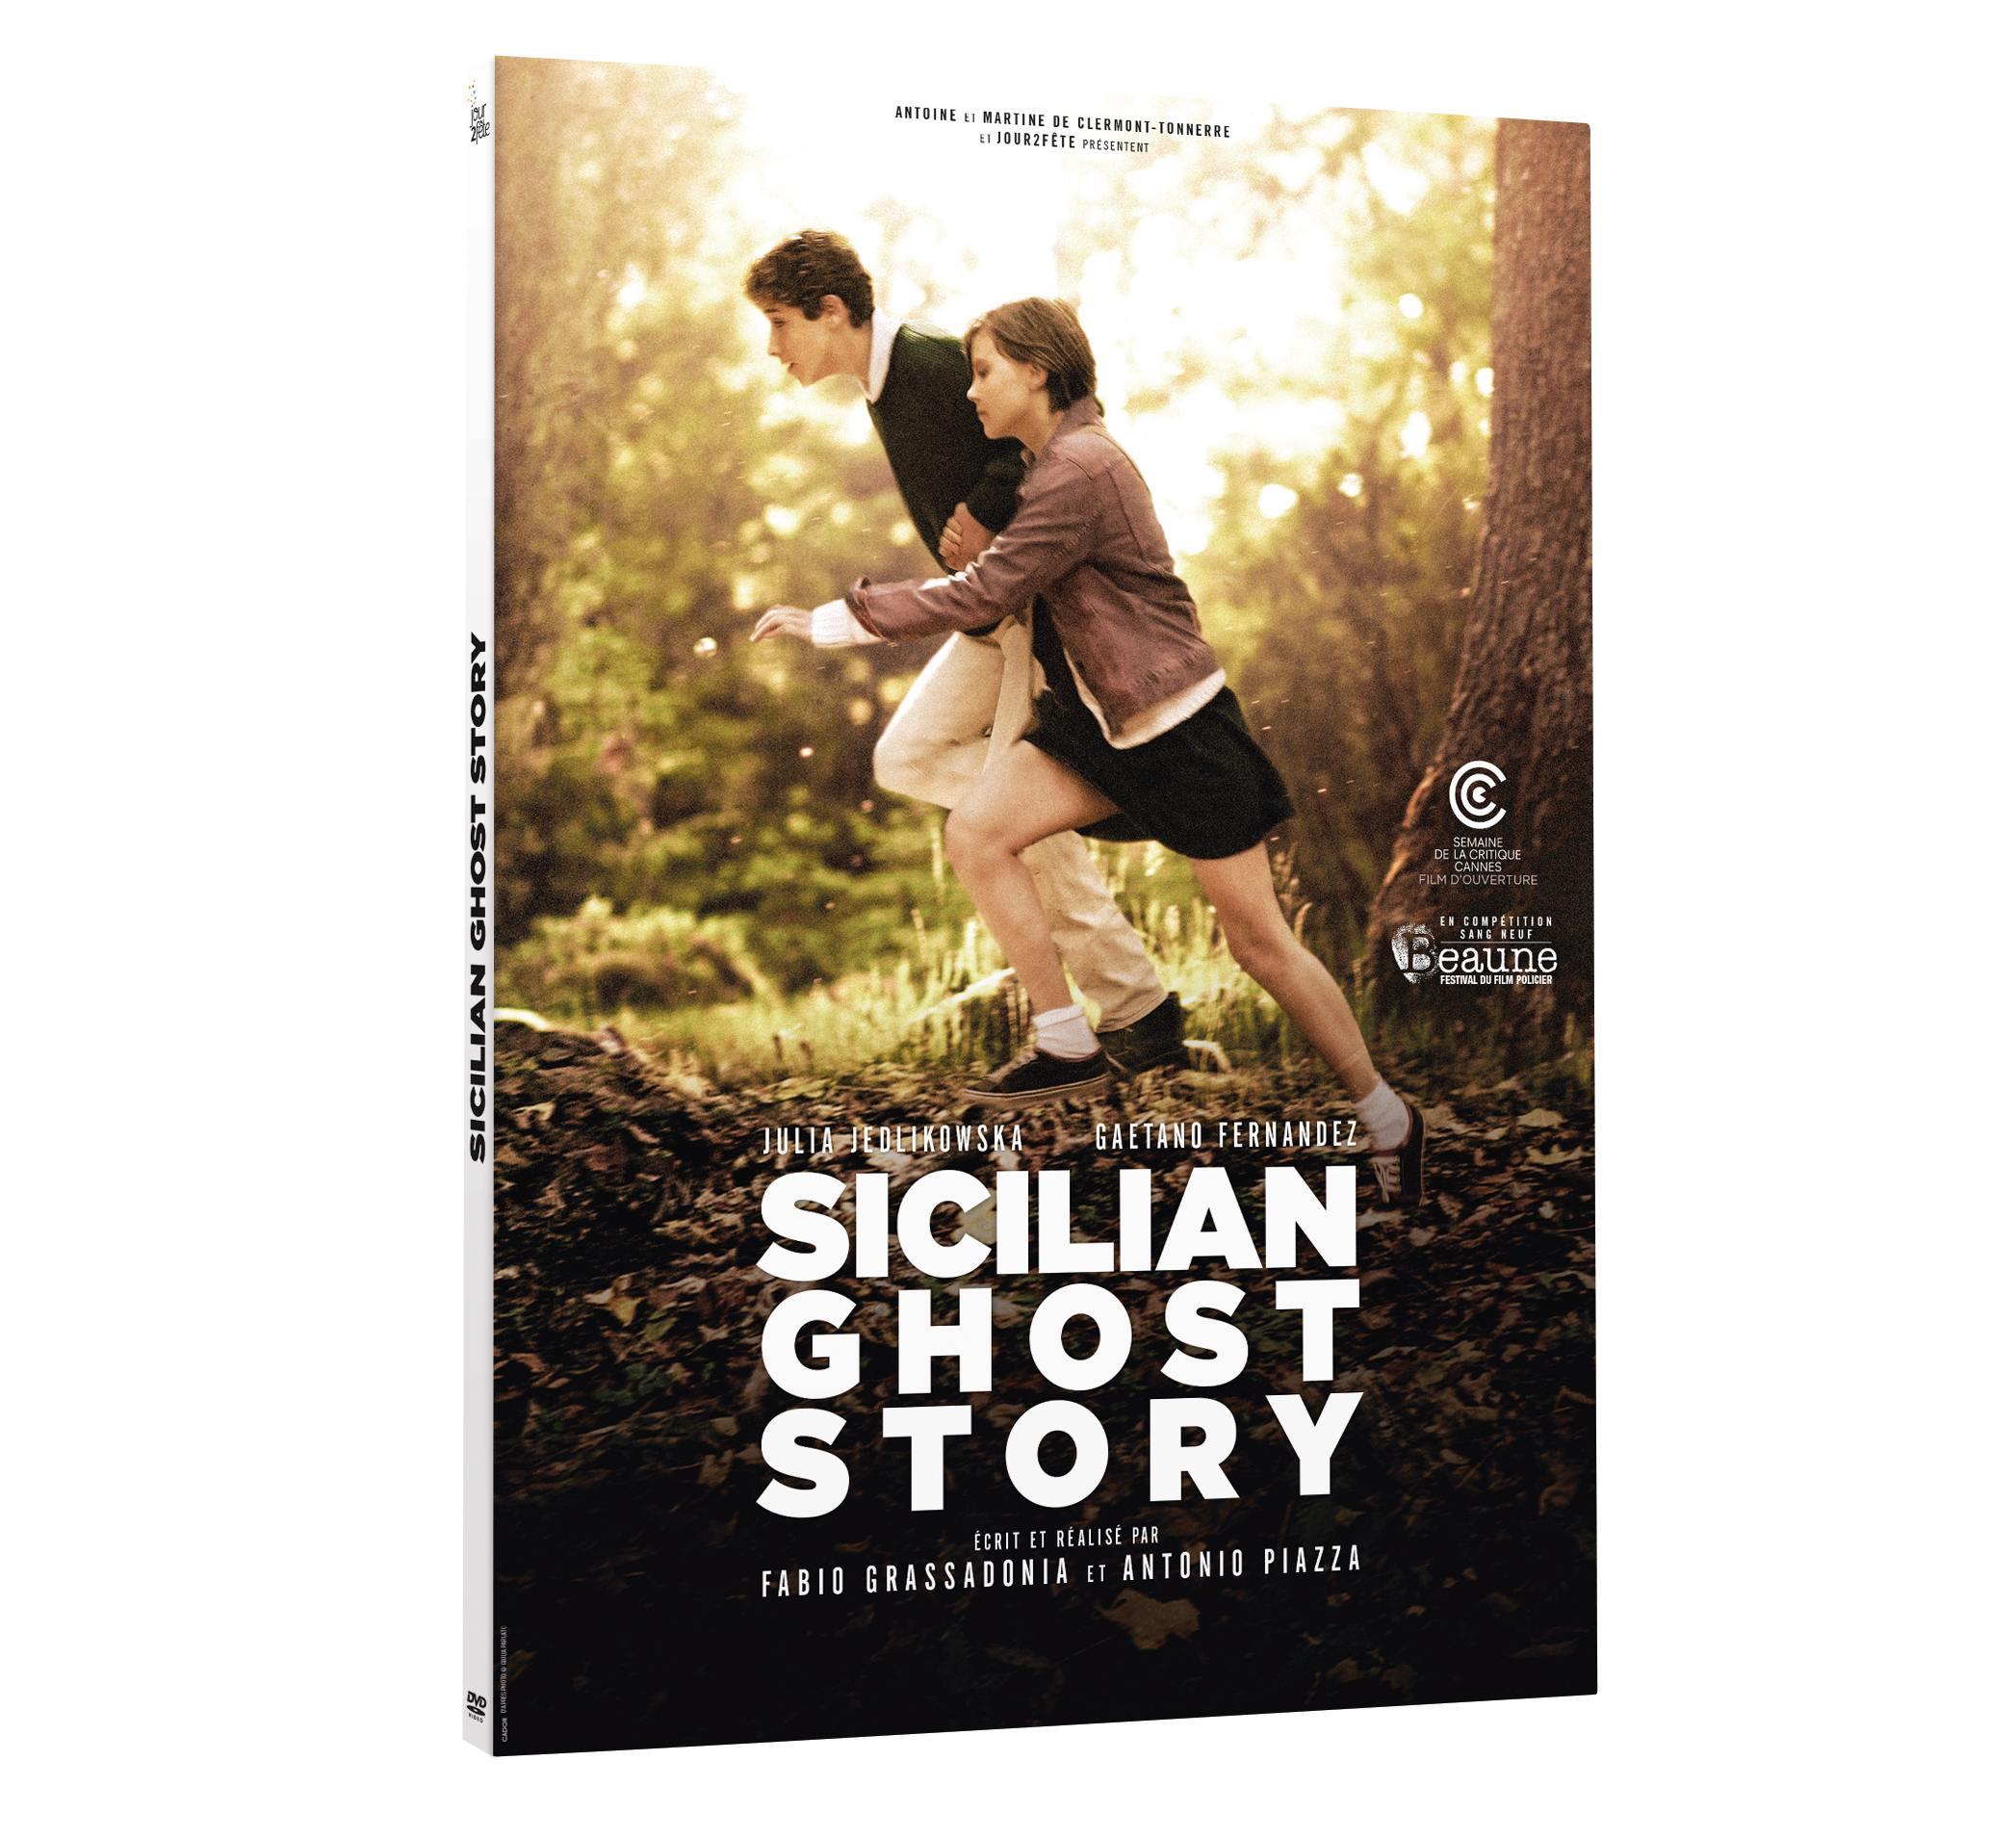 Sicilian ghost story - dvd